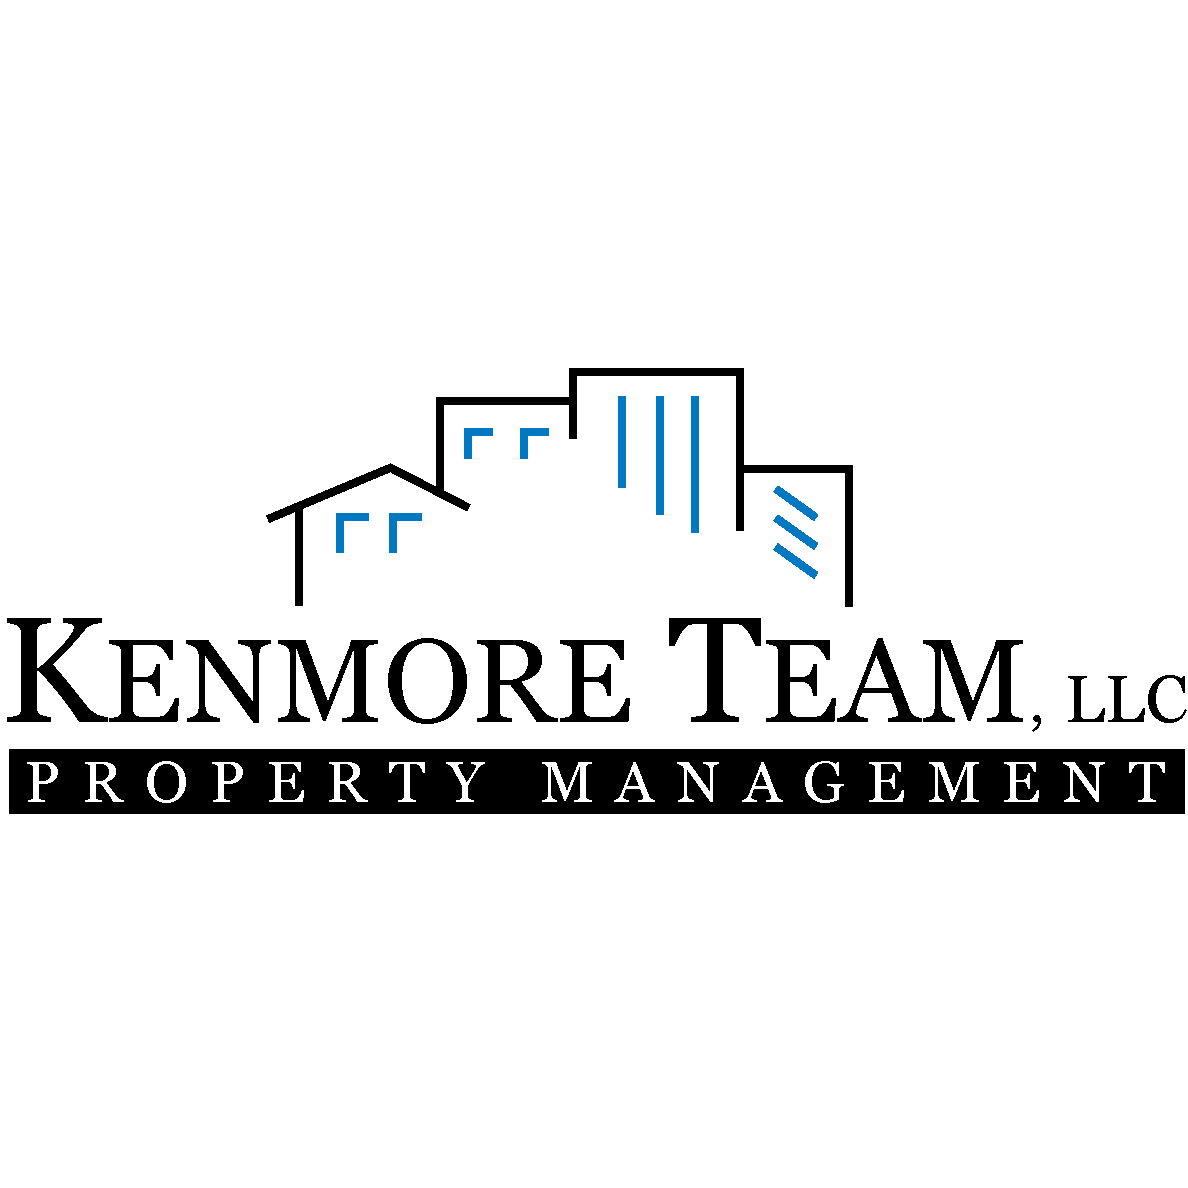 Kenmore Team Property Management, LLC